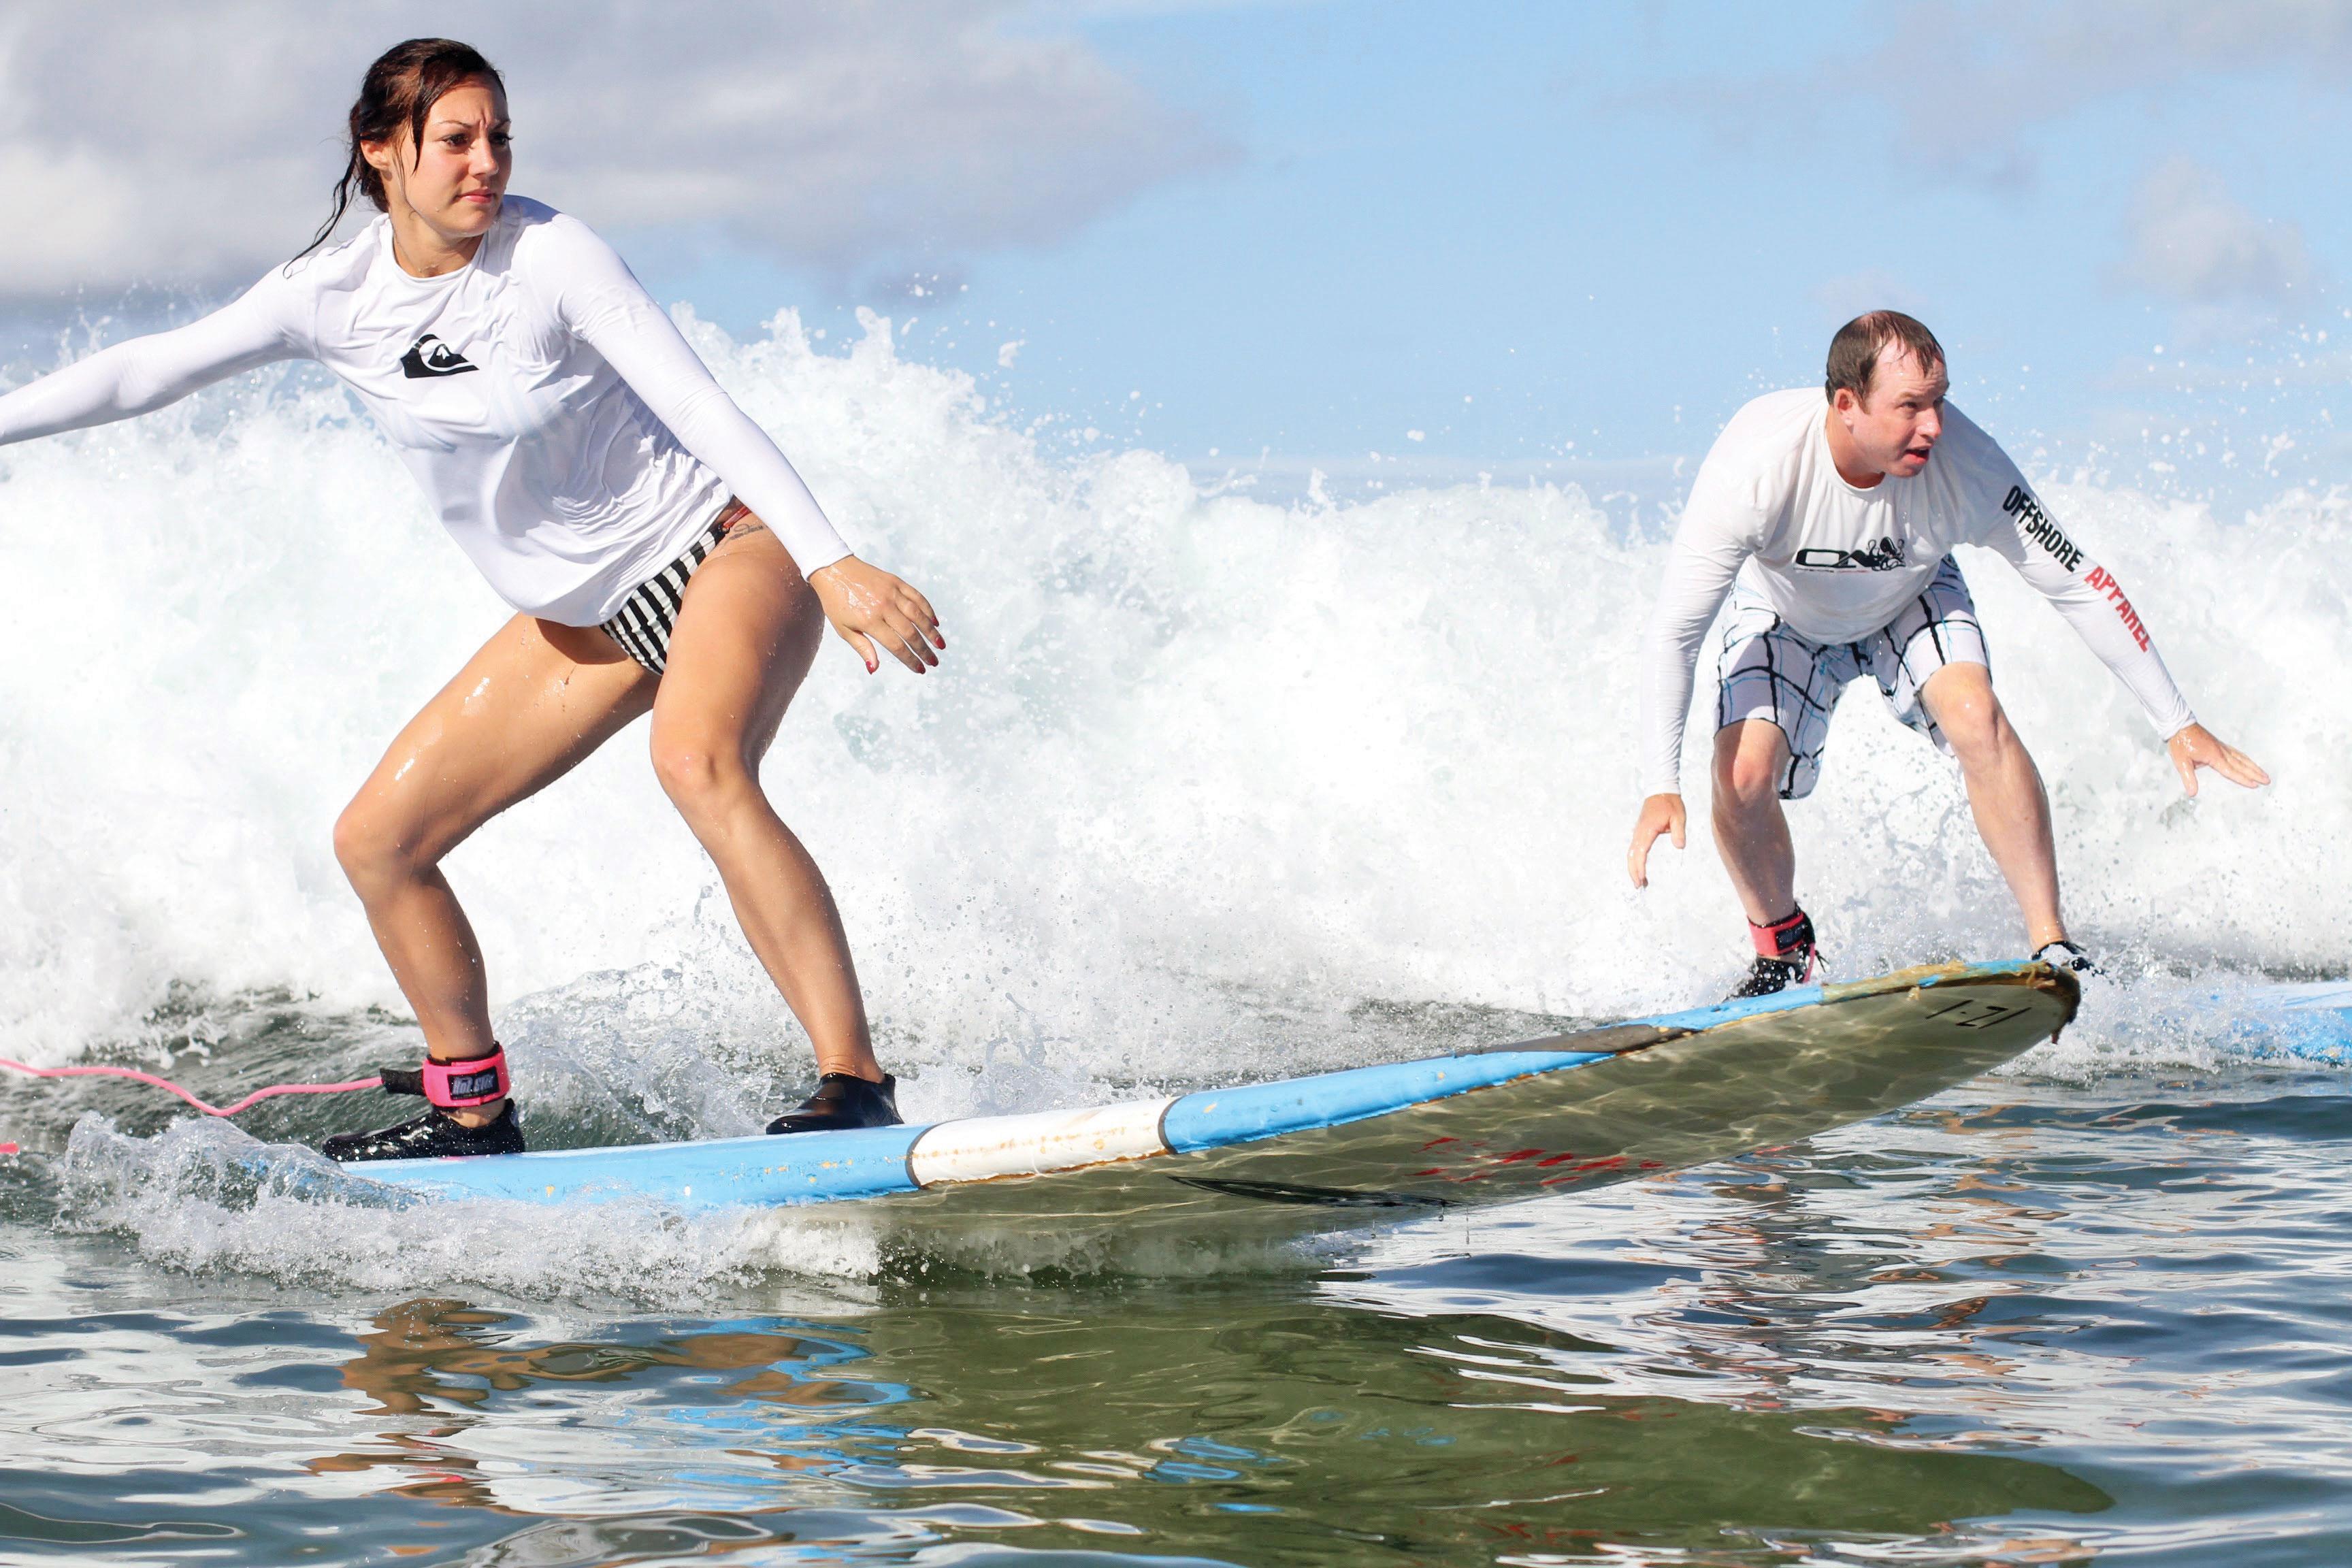 honeymoon surfing